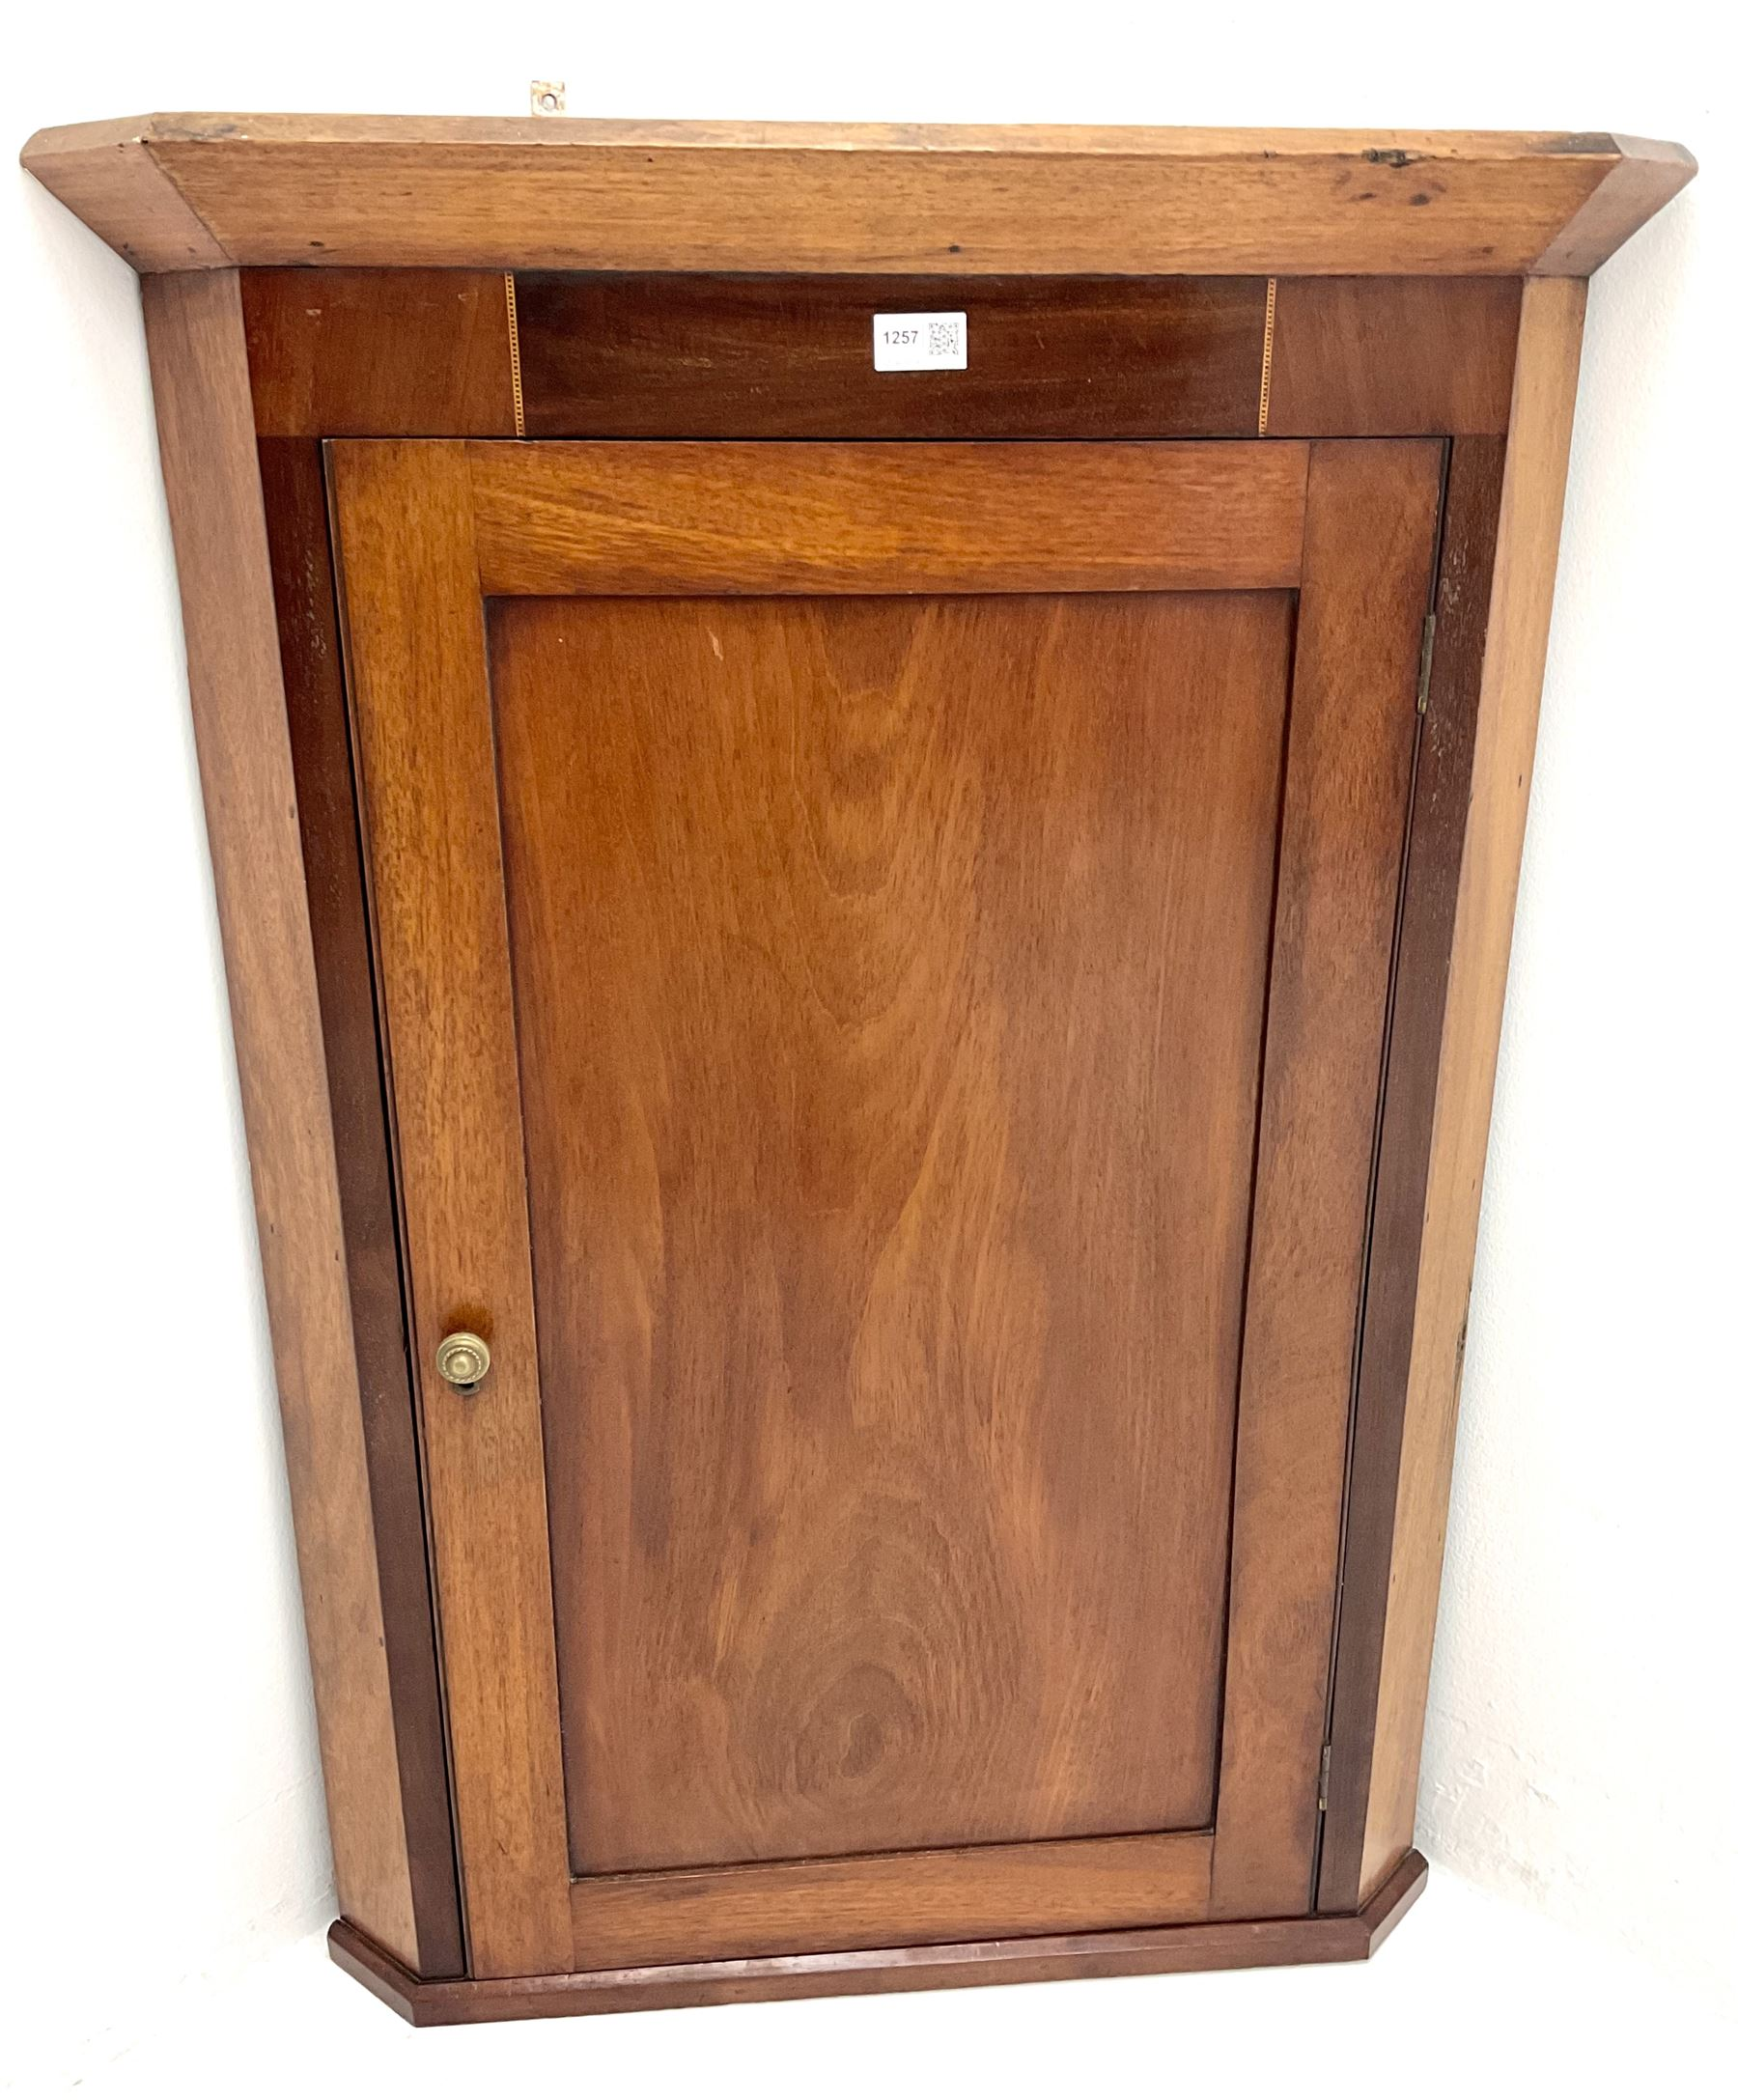 19th century inlaid mahogany corner wall cupboard - Image 2 of 2